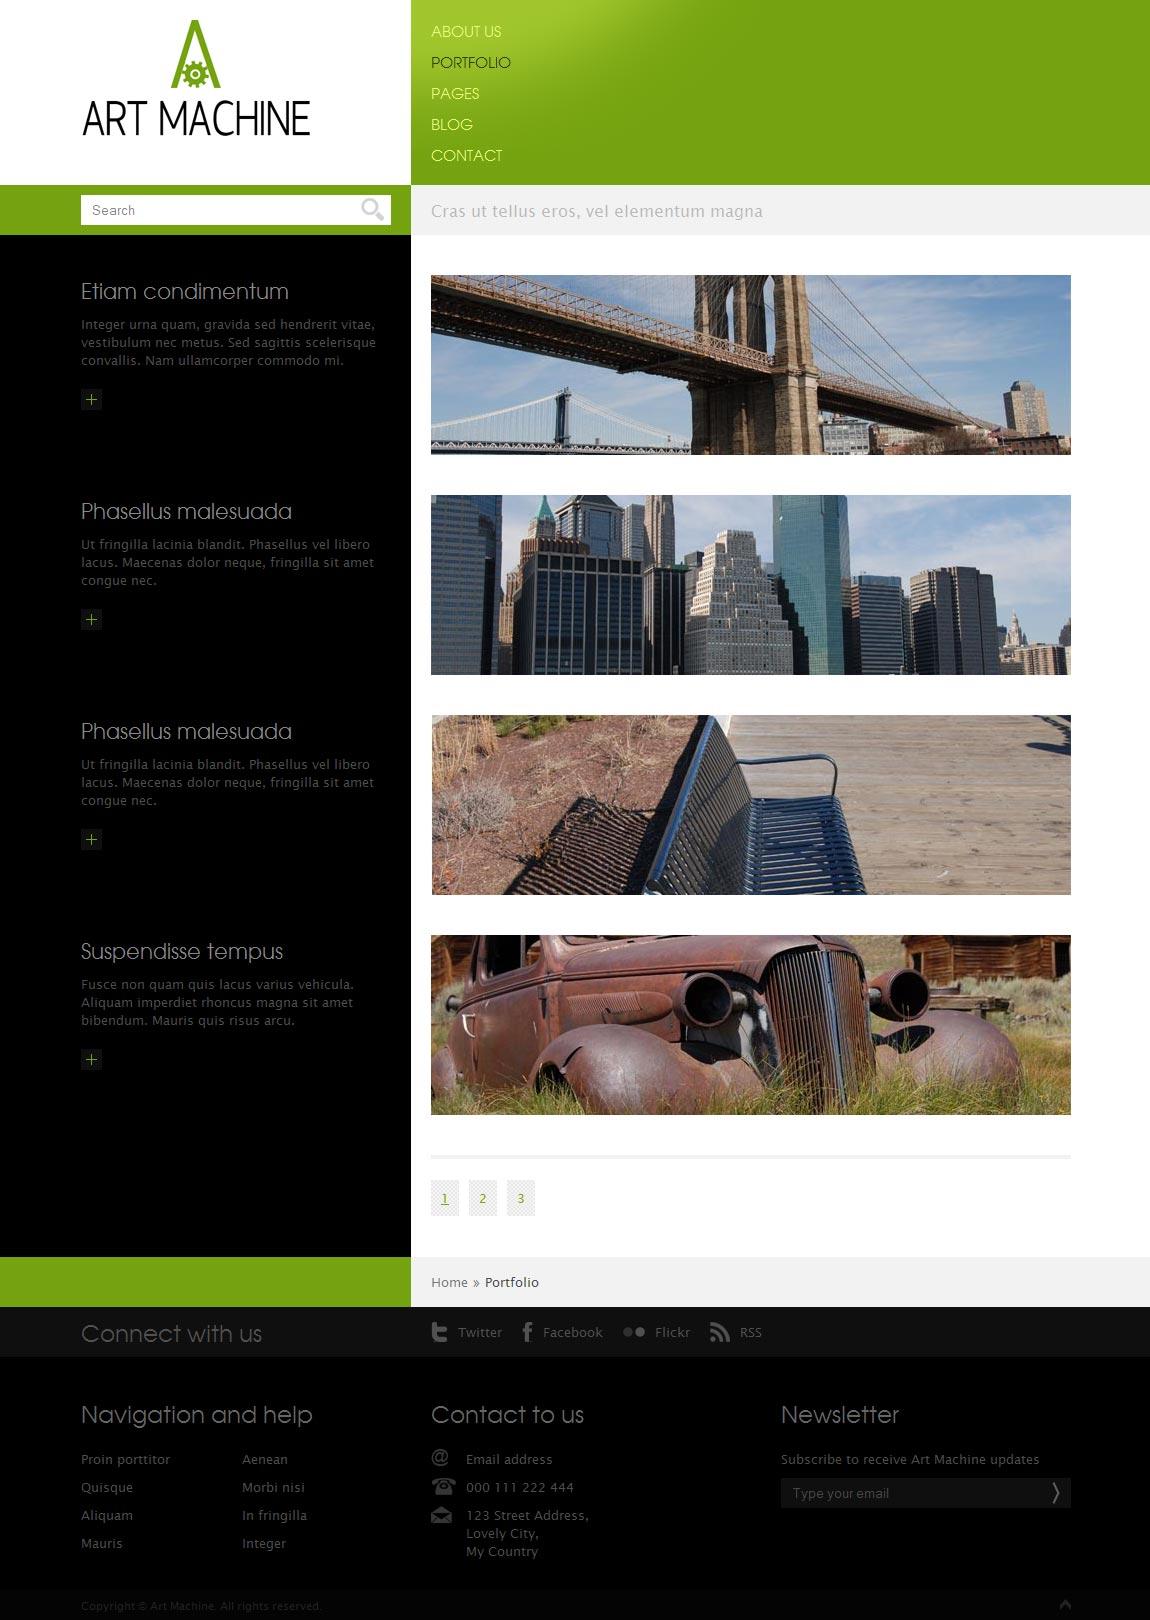 Art Machine HTML Template - Portfolio page - style 1.